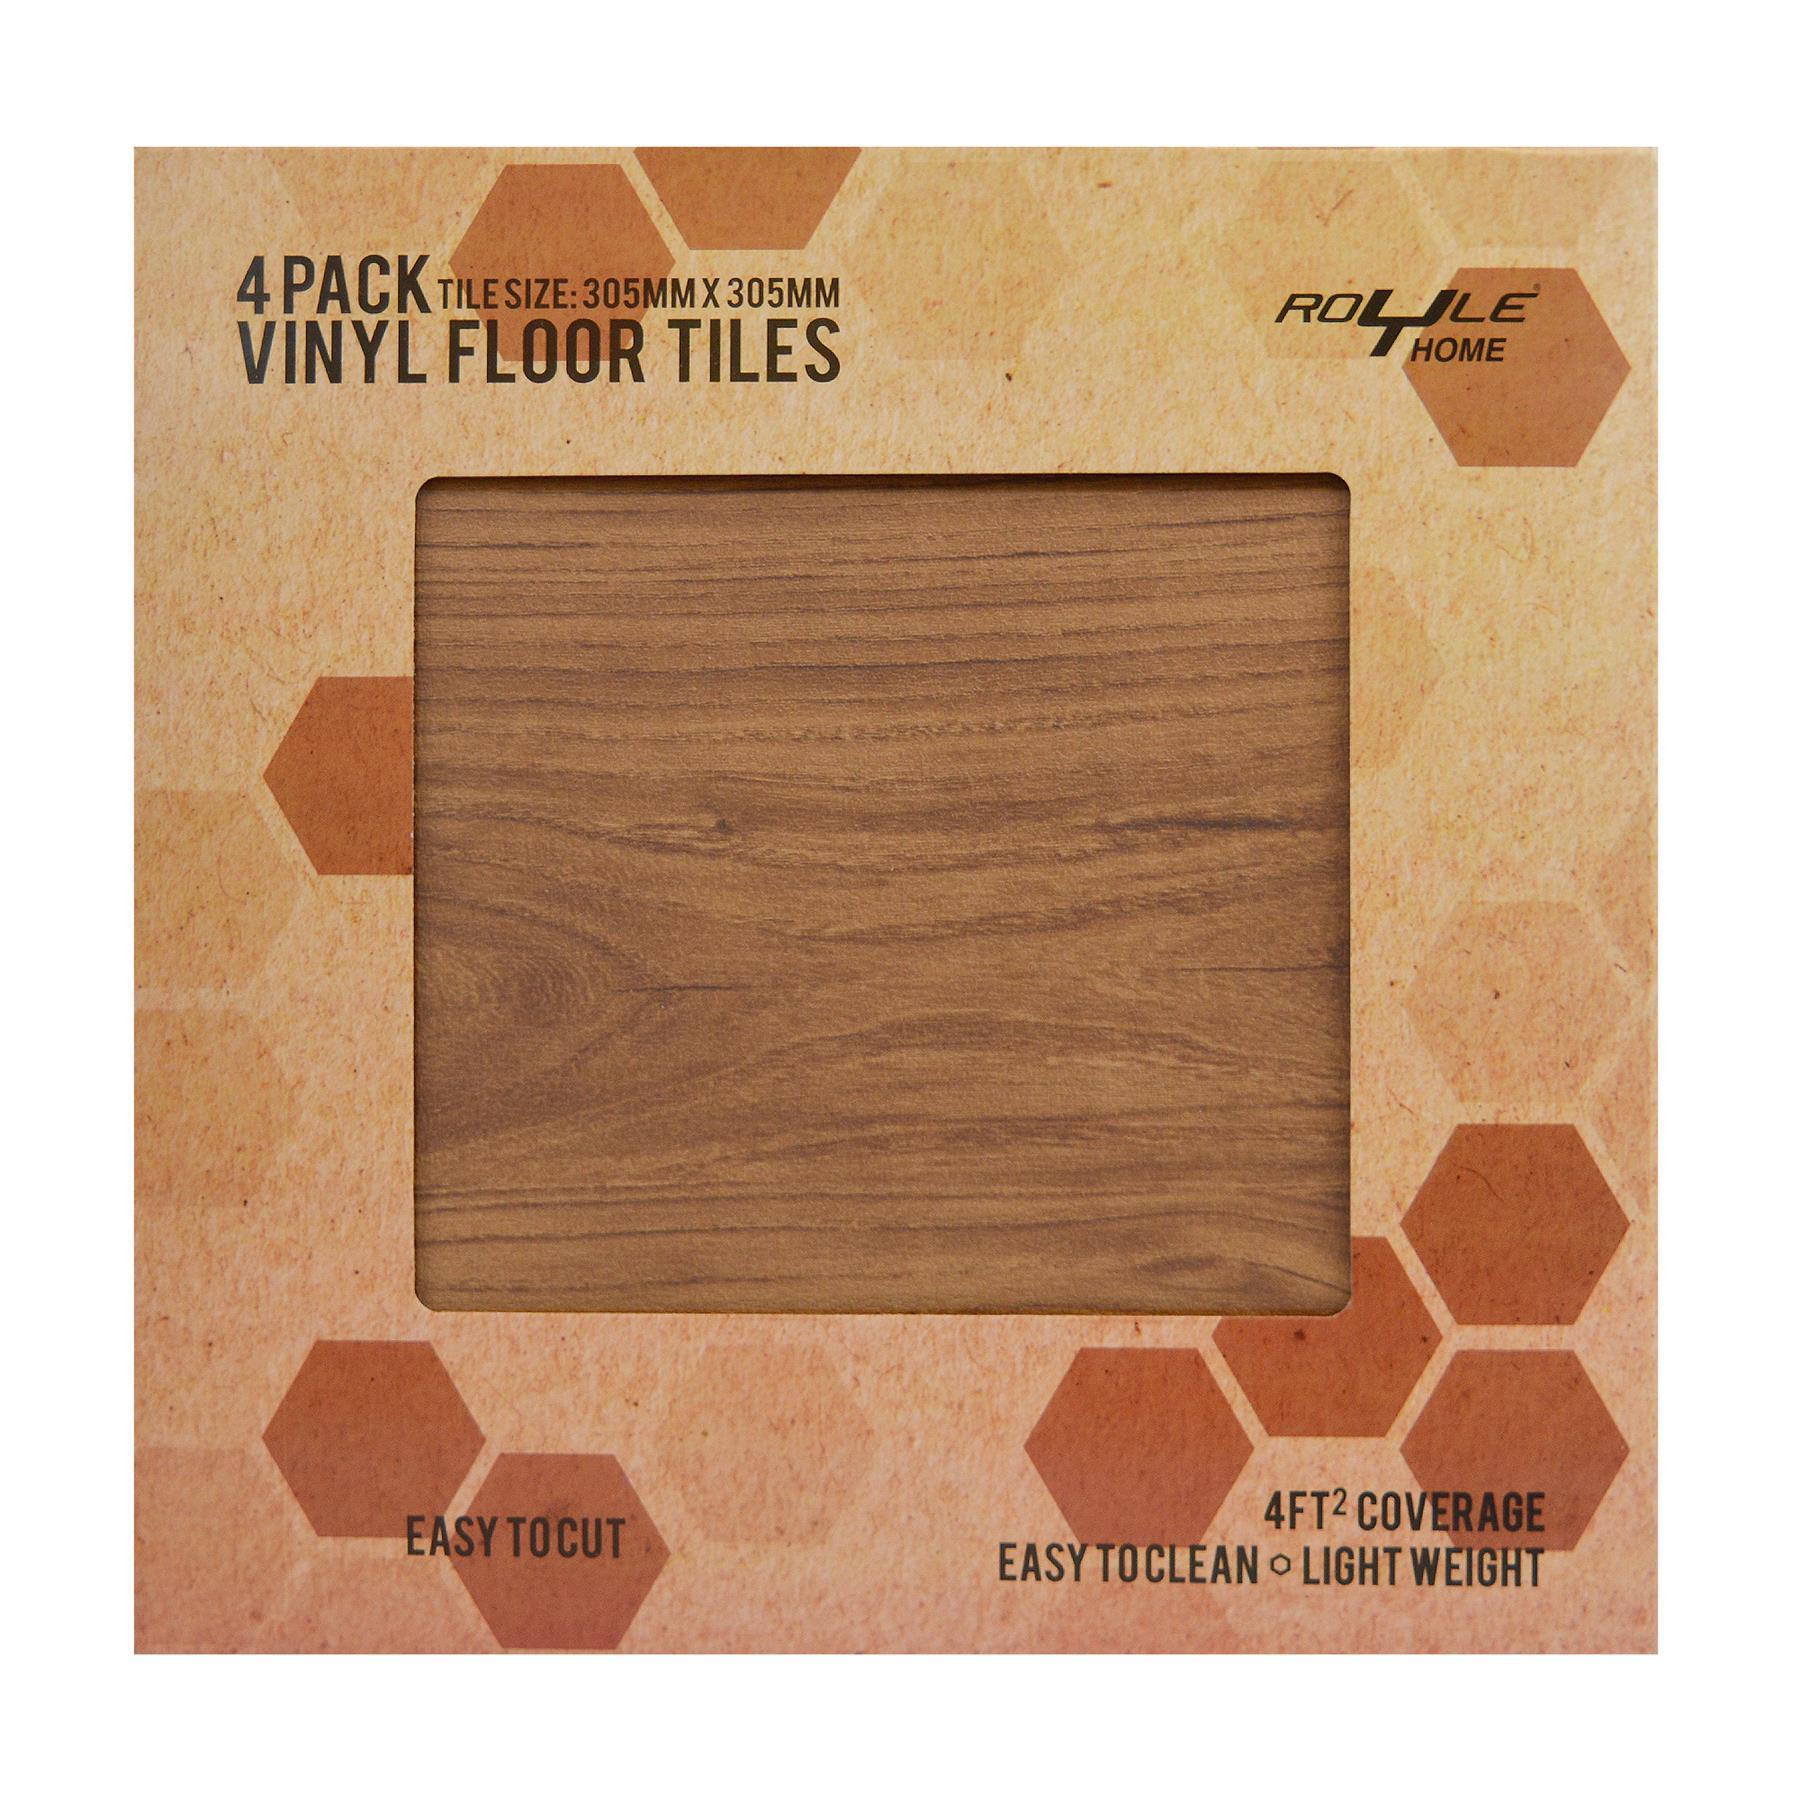 Floor-Tiles-Self-Adhesive-Vinyl-Flooring-Kitchen-Bathroom-Brown-Wood-Grain thumbnail 35